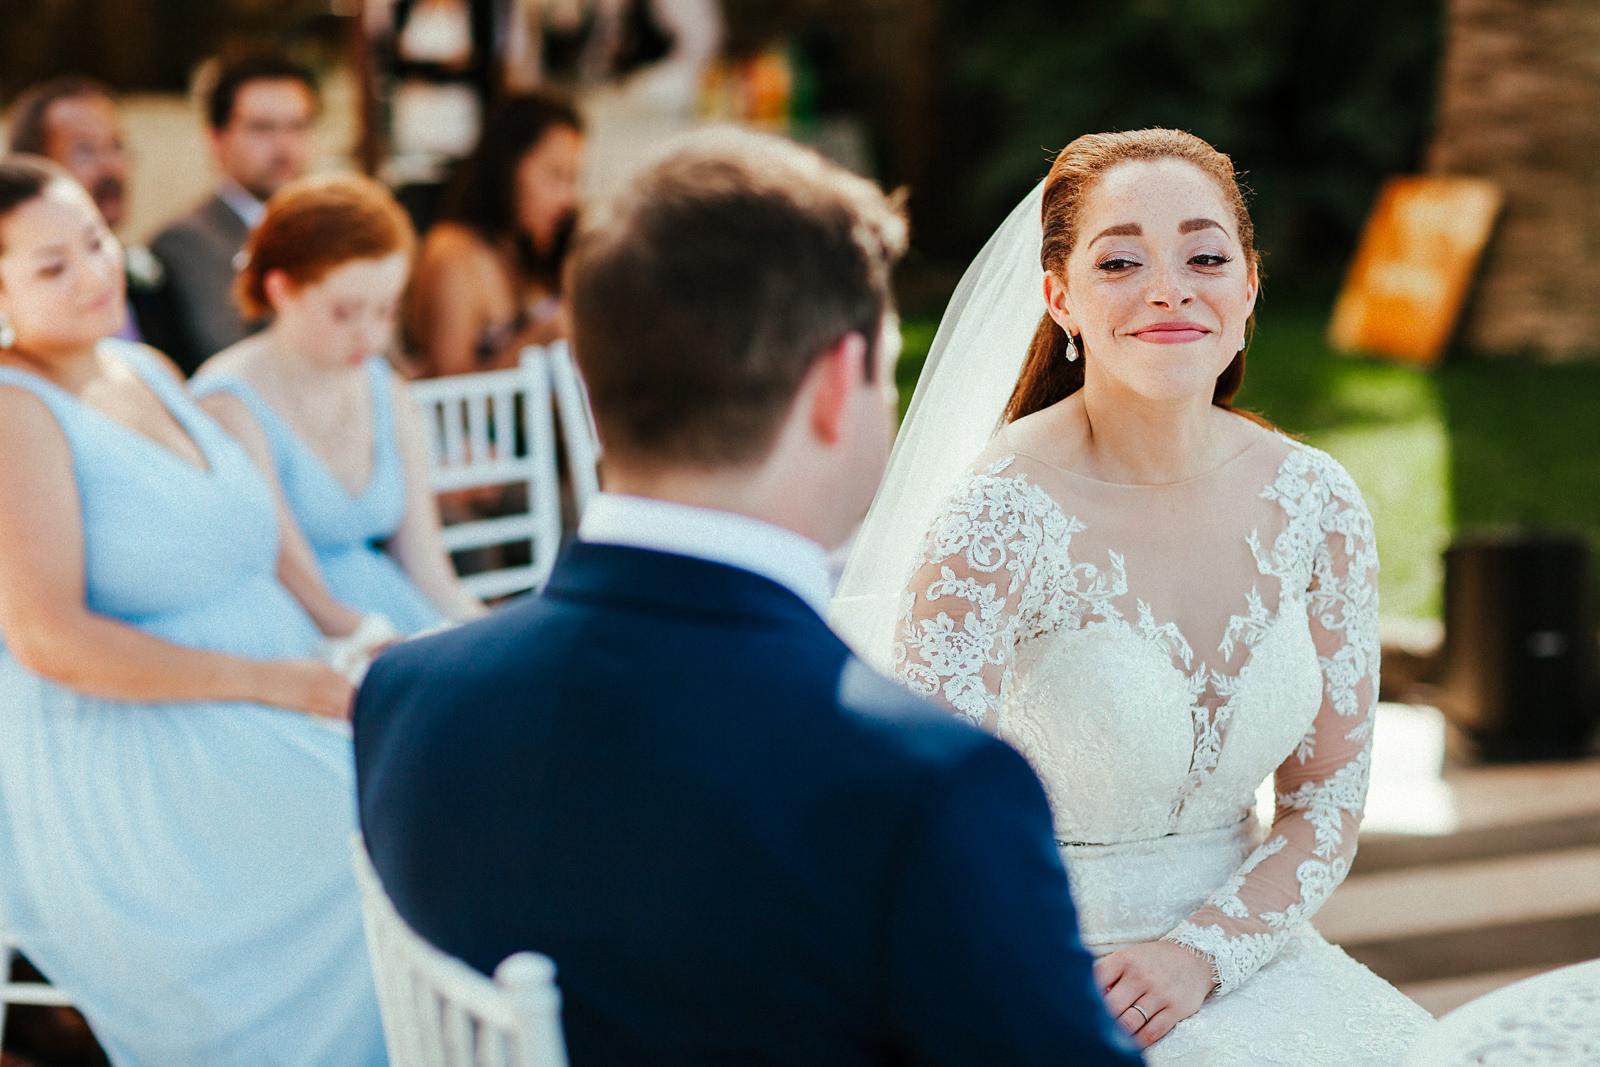 Natural Destination wedding photography